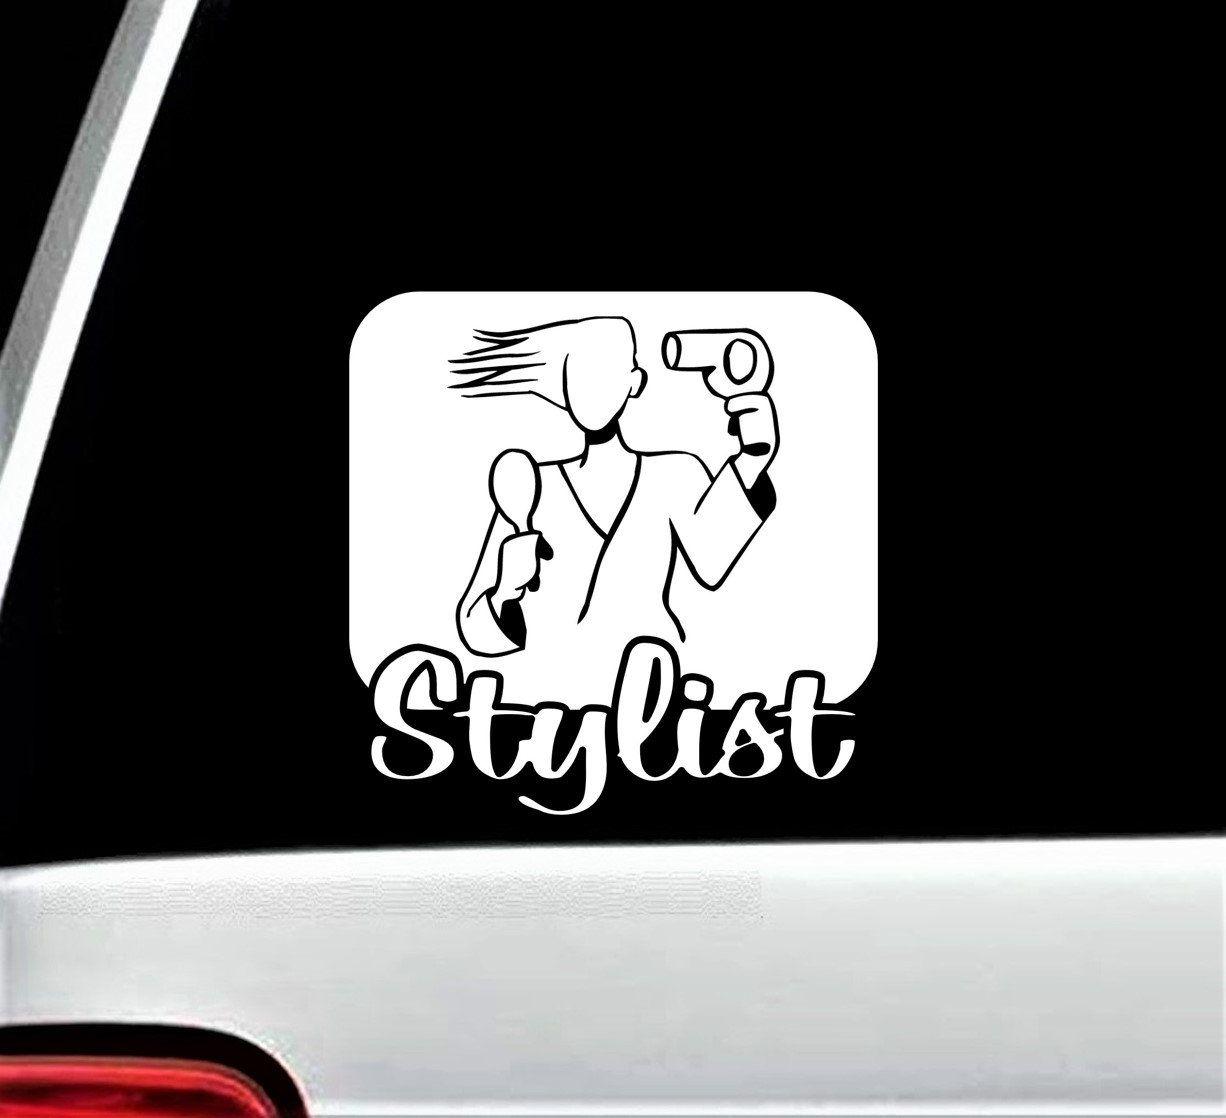 Hair Stylist Decal For Car Window Stylist Decal Sticker Etsy Salon Decals Car Decals Decal Design [ 1118 x 1226 Pixel ]